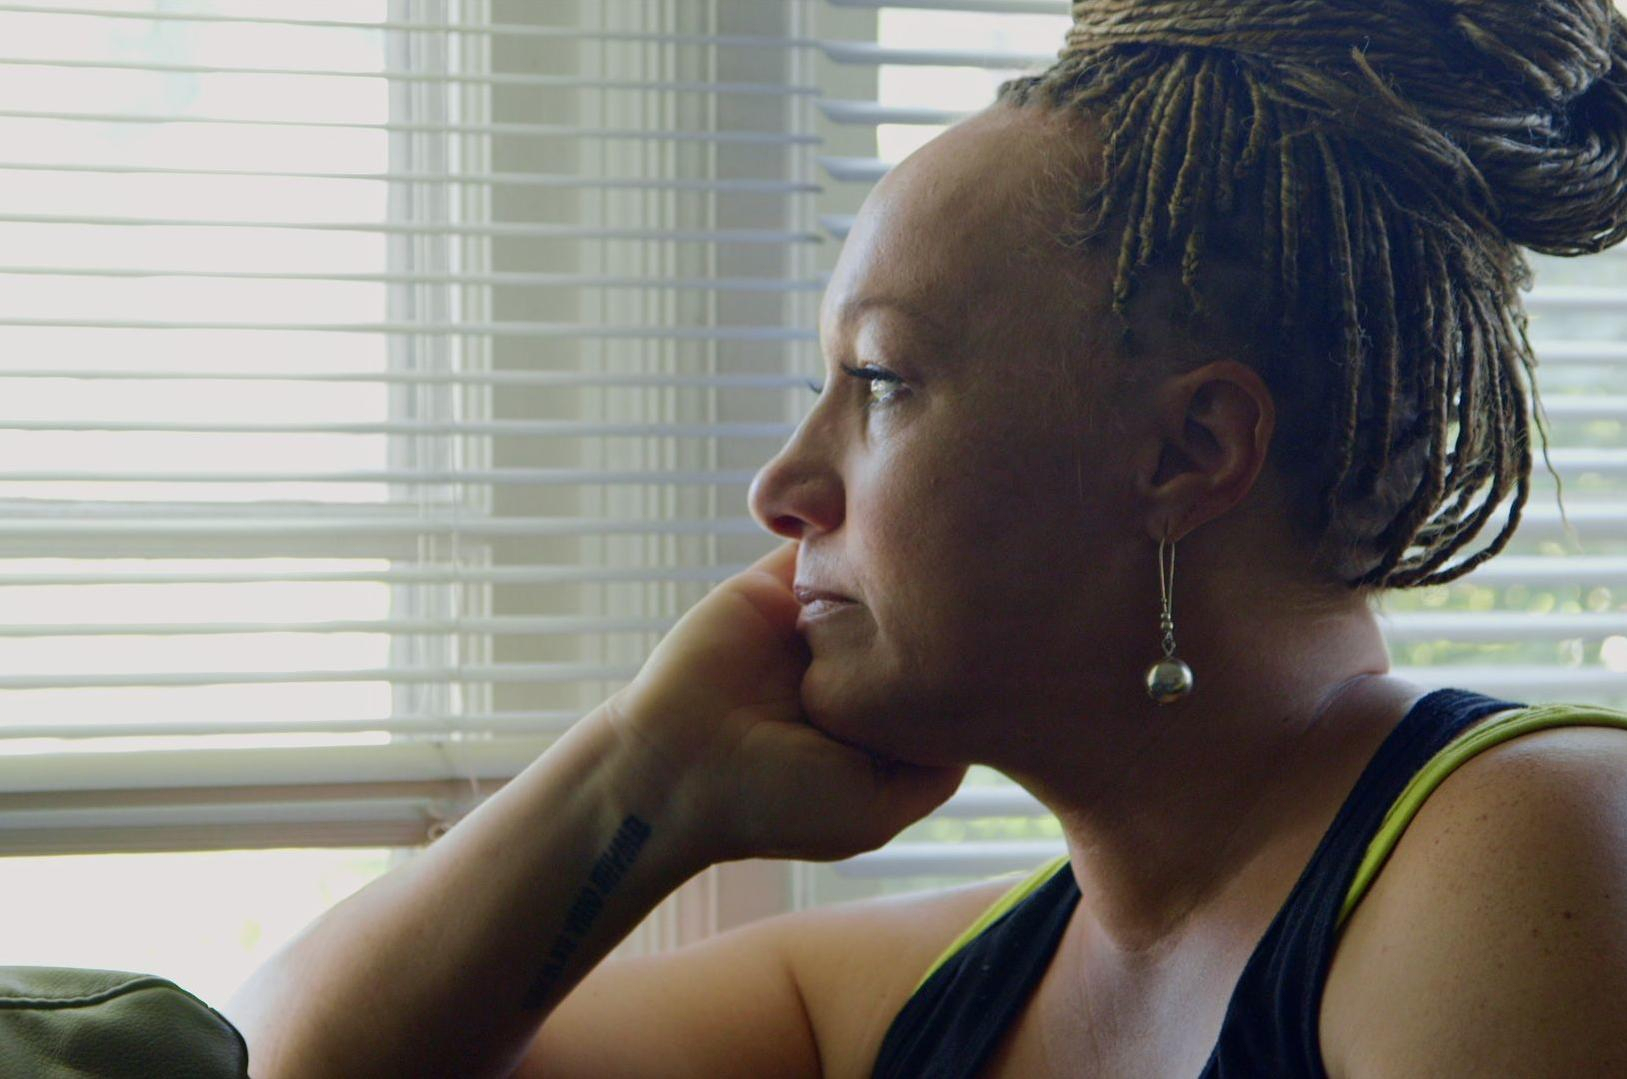 Rachel Dolezal pleads not guilty to welfare fraud | The ...